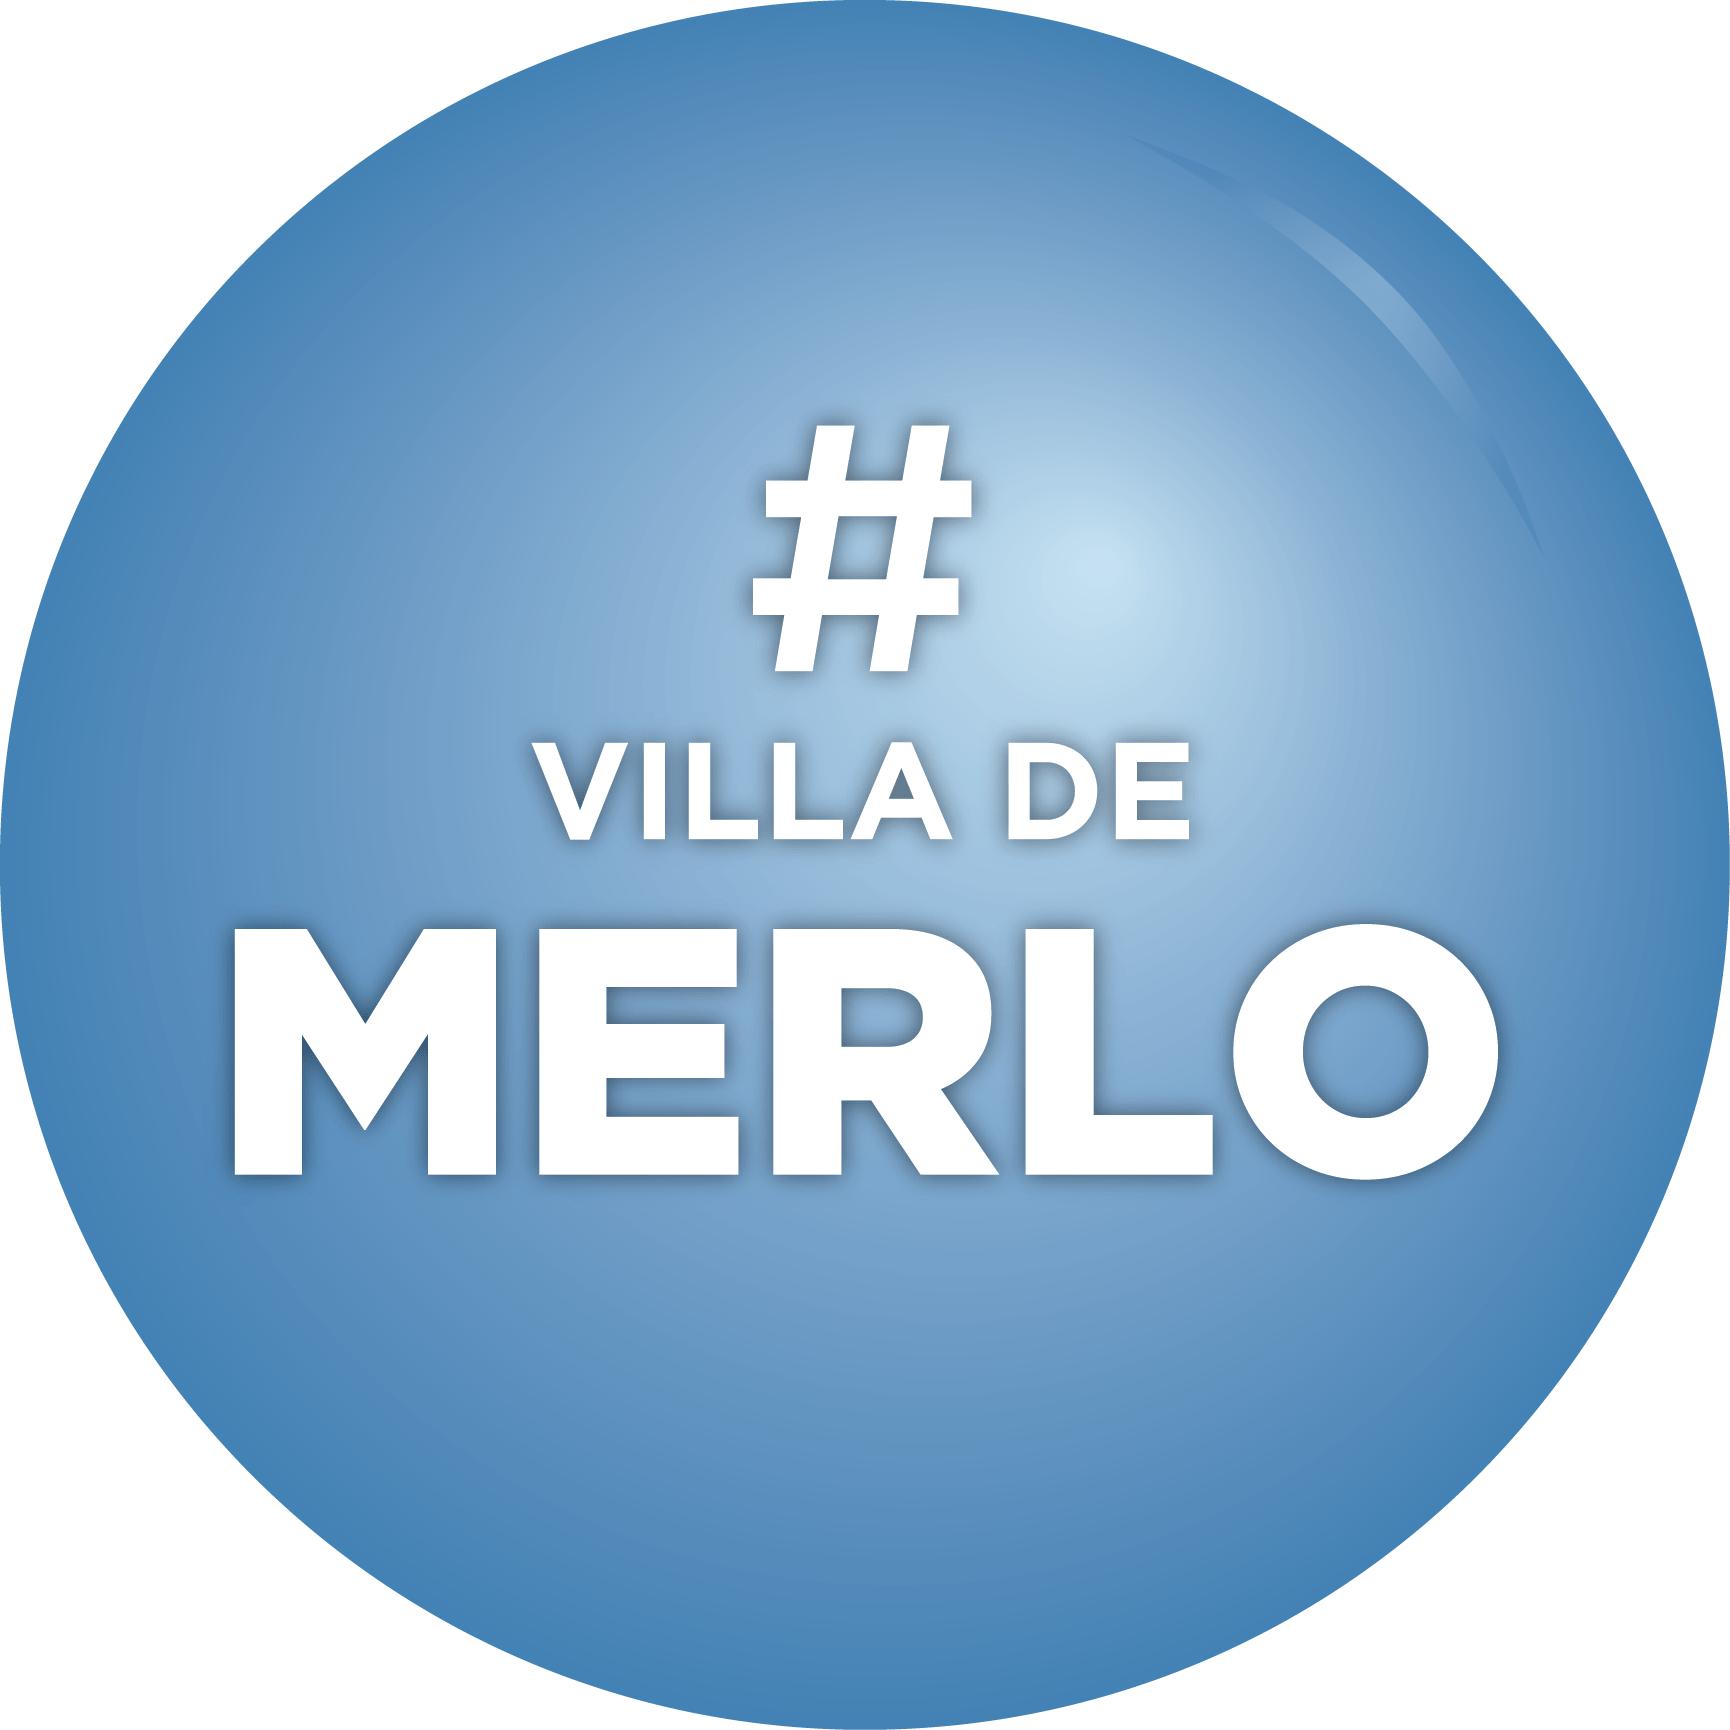 Municipio de Villa de Merlo